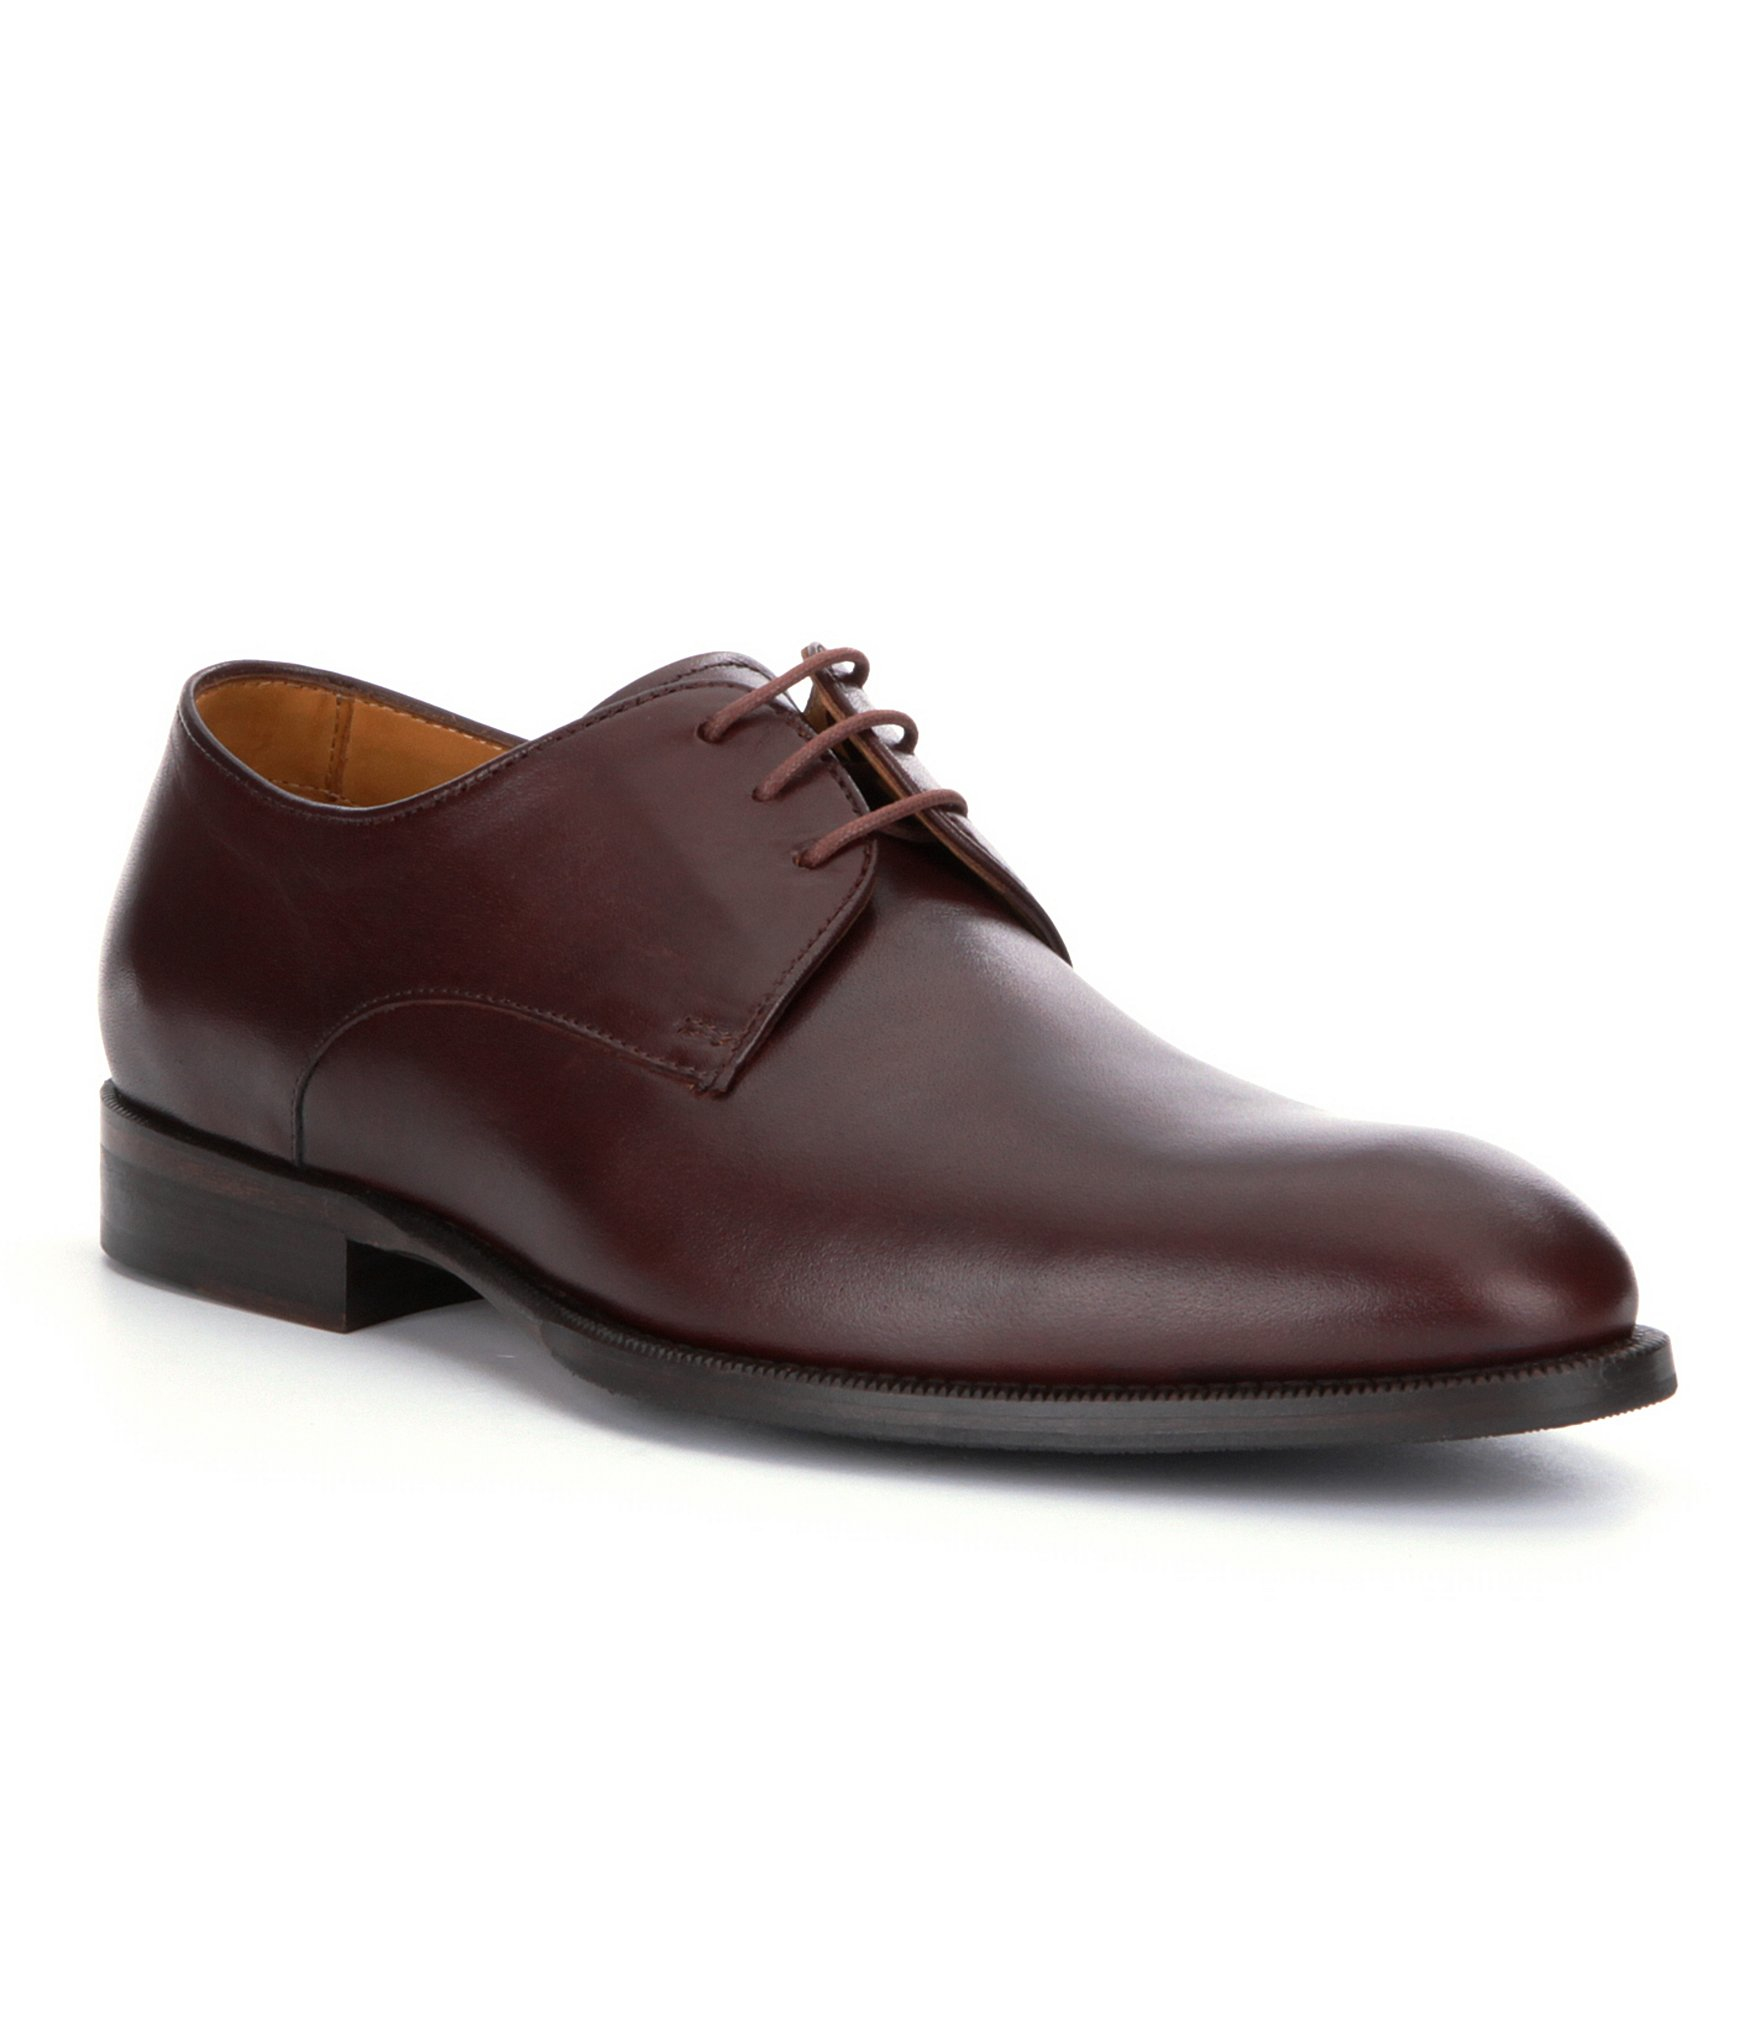 Brogan Dress Shoes